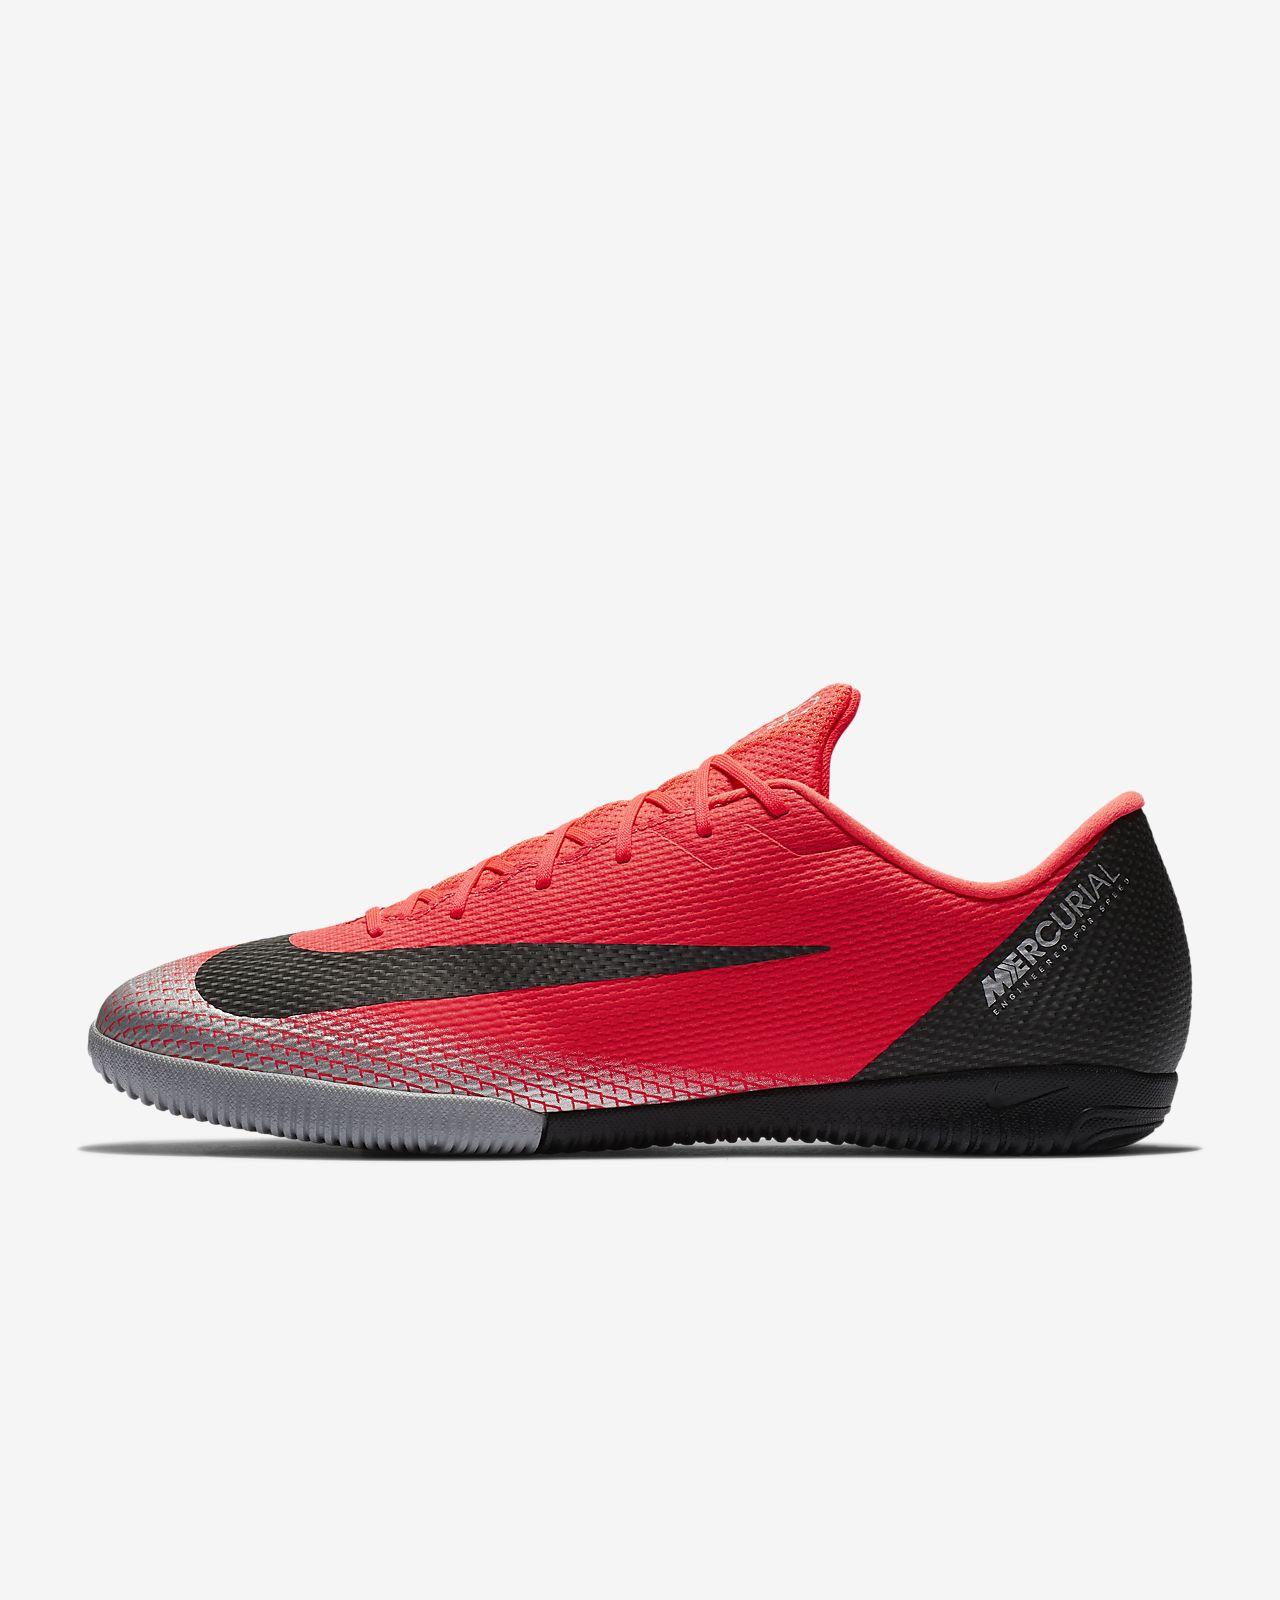 Salle Vapor Cr7 Mercurialx Xii Academy En Football De Nike Chaussure aqSAOwA